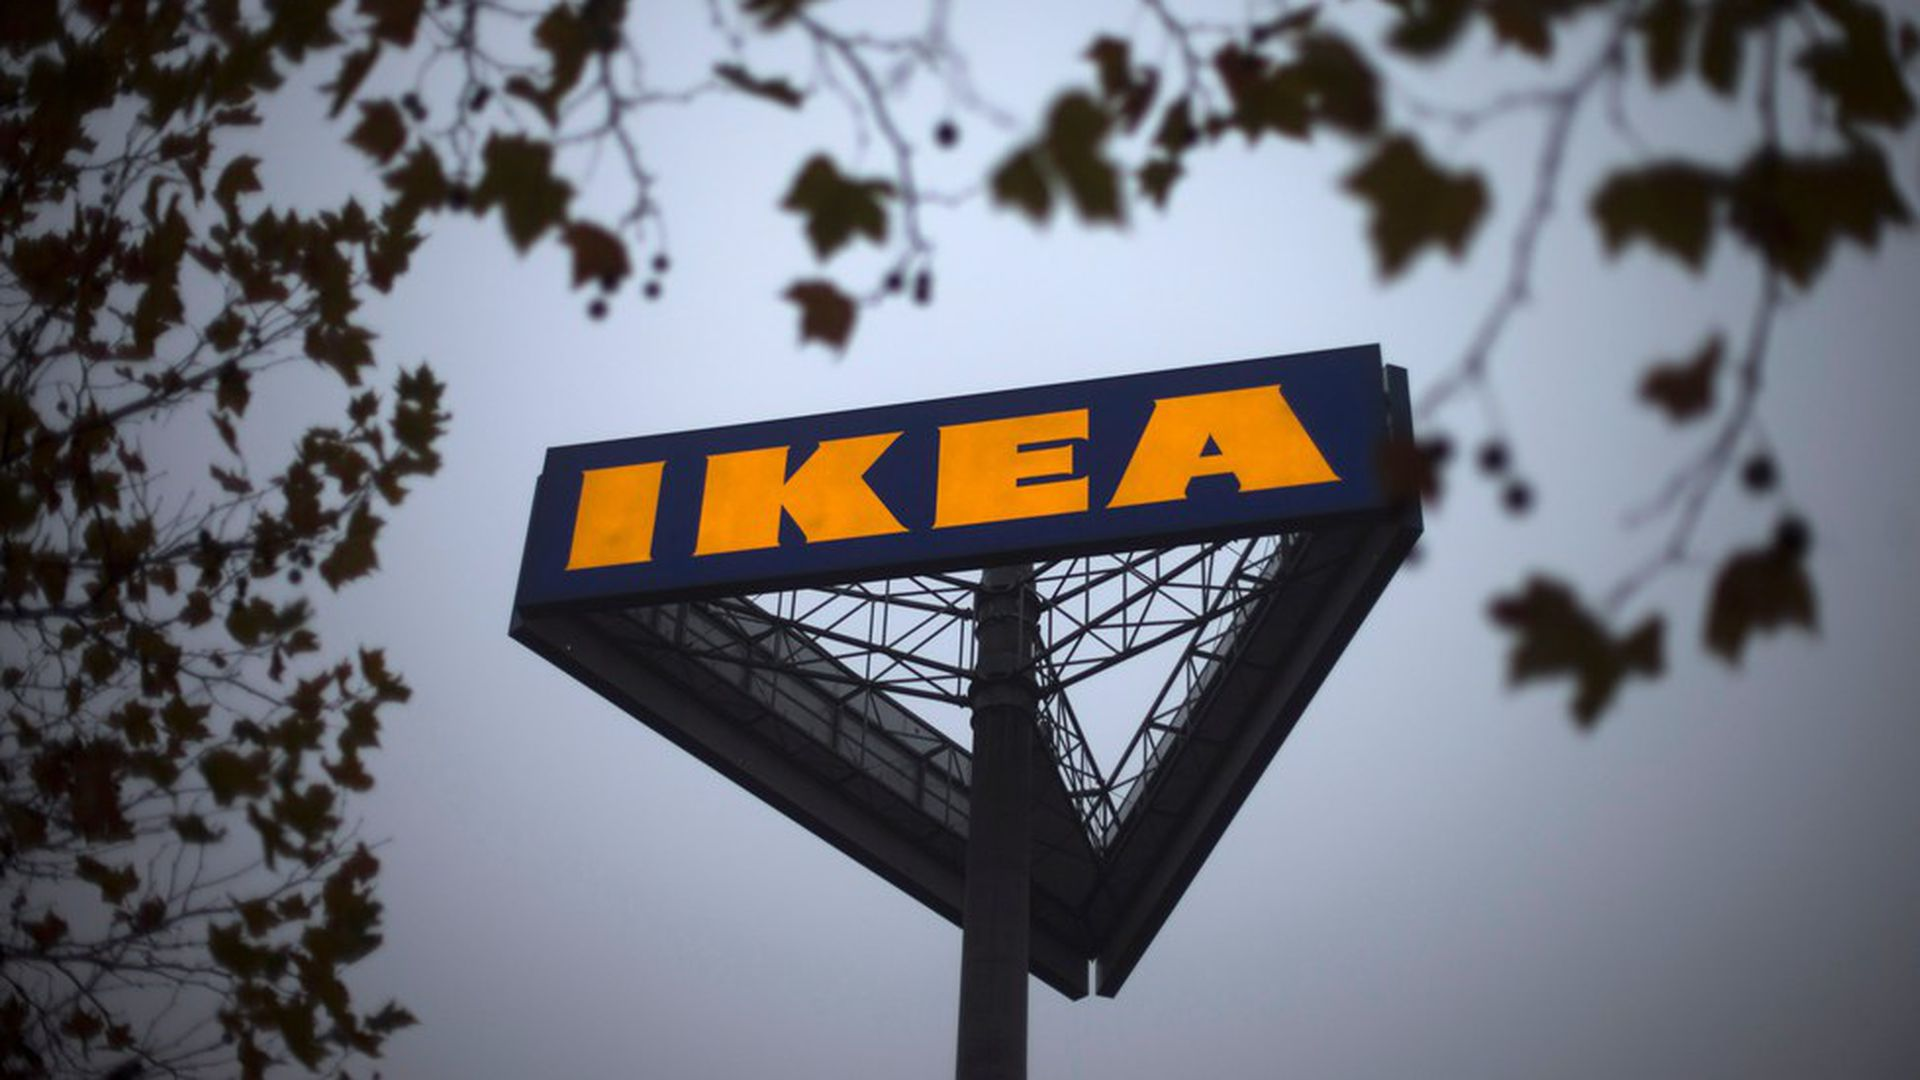 Ikea buys TaskRabbit and gets into gig economy - Axios